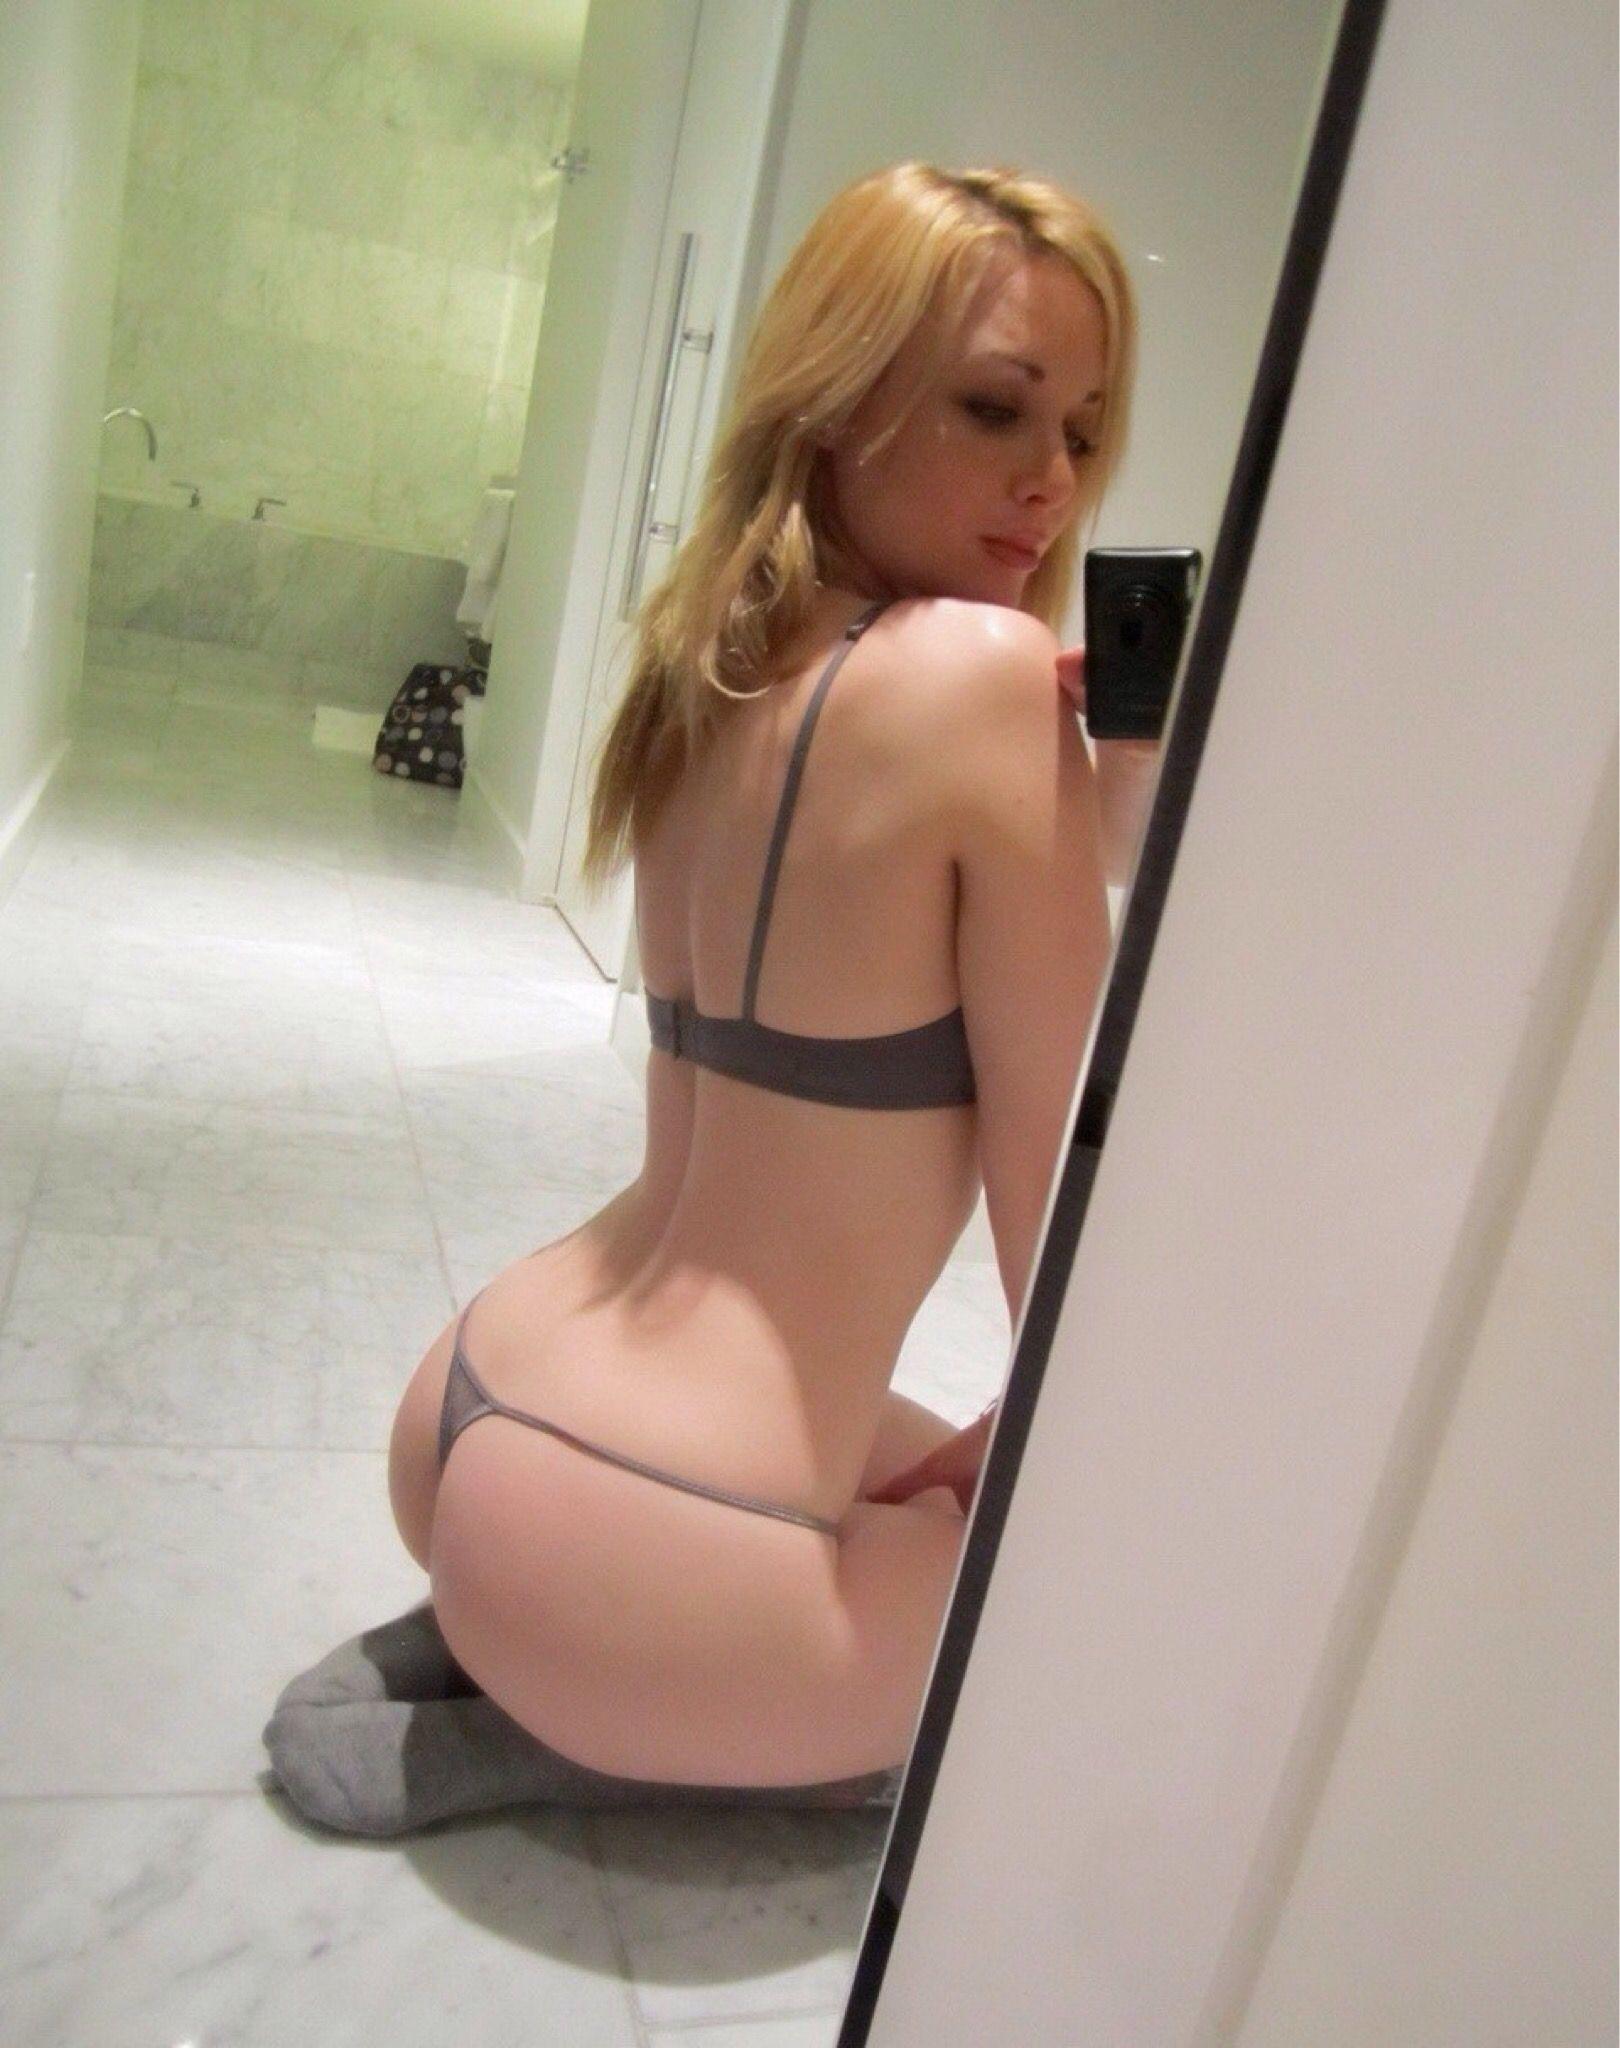 Hot tight ass girl amateur naked